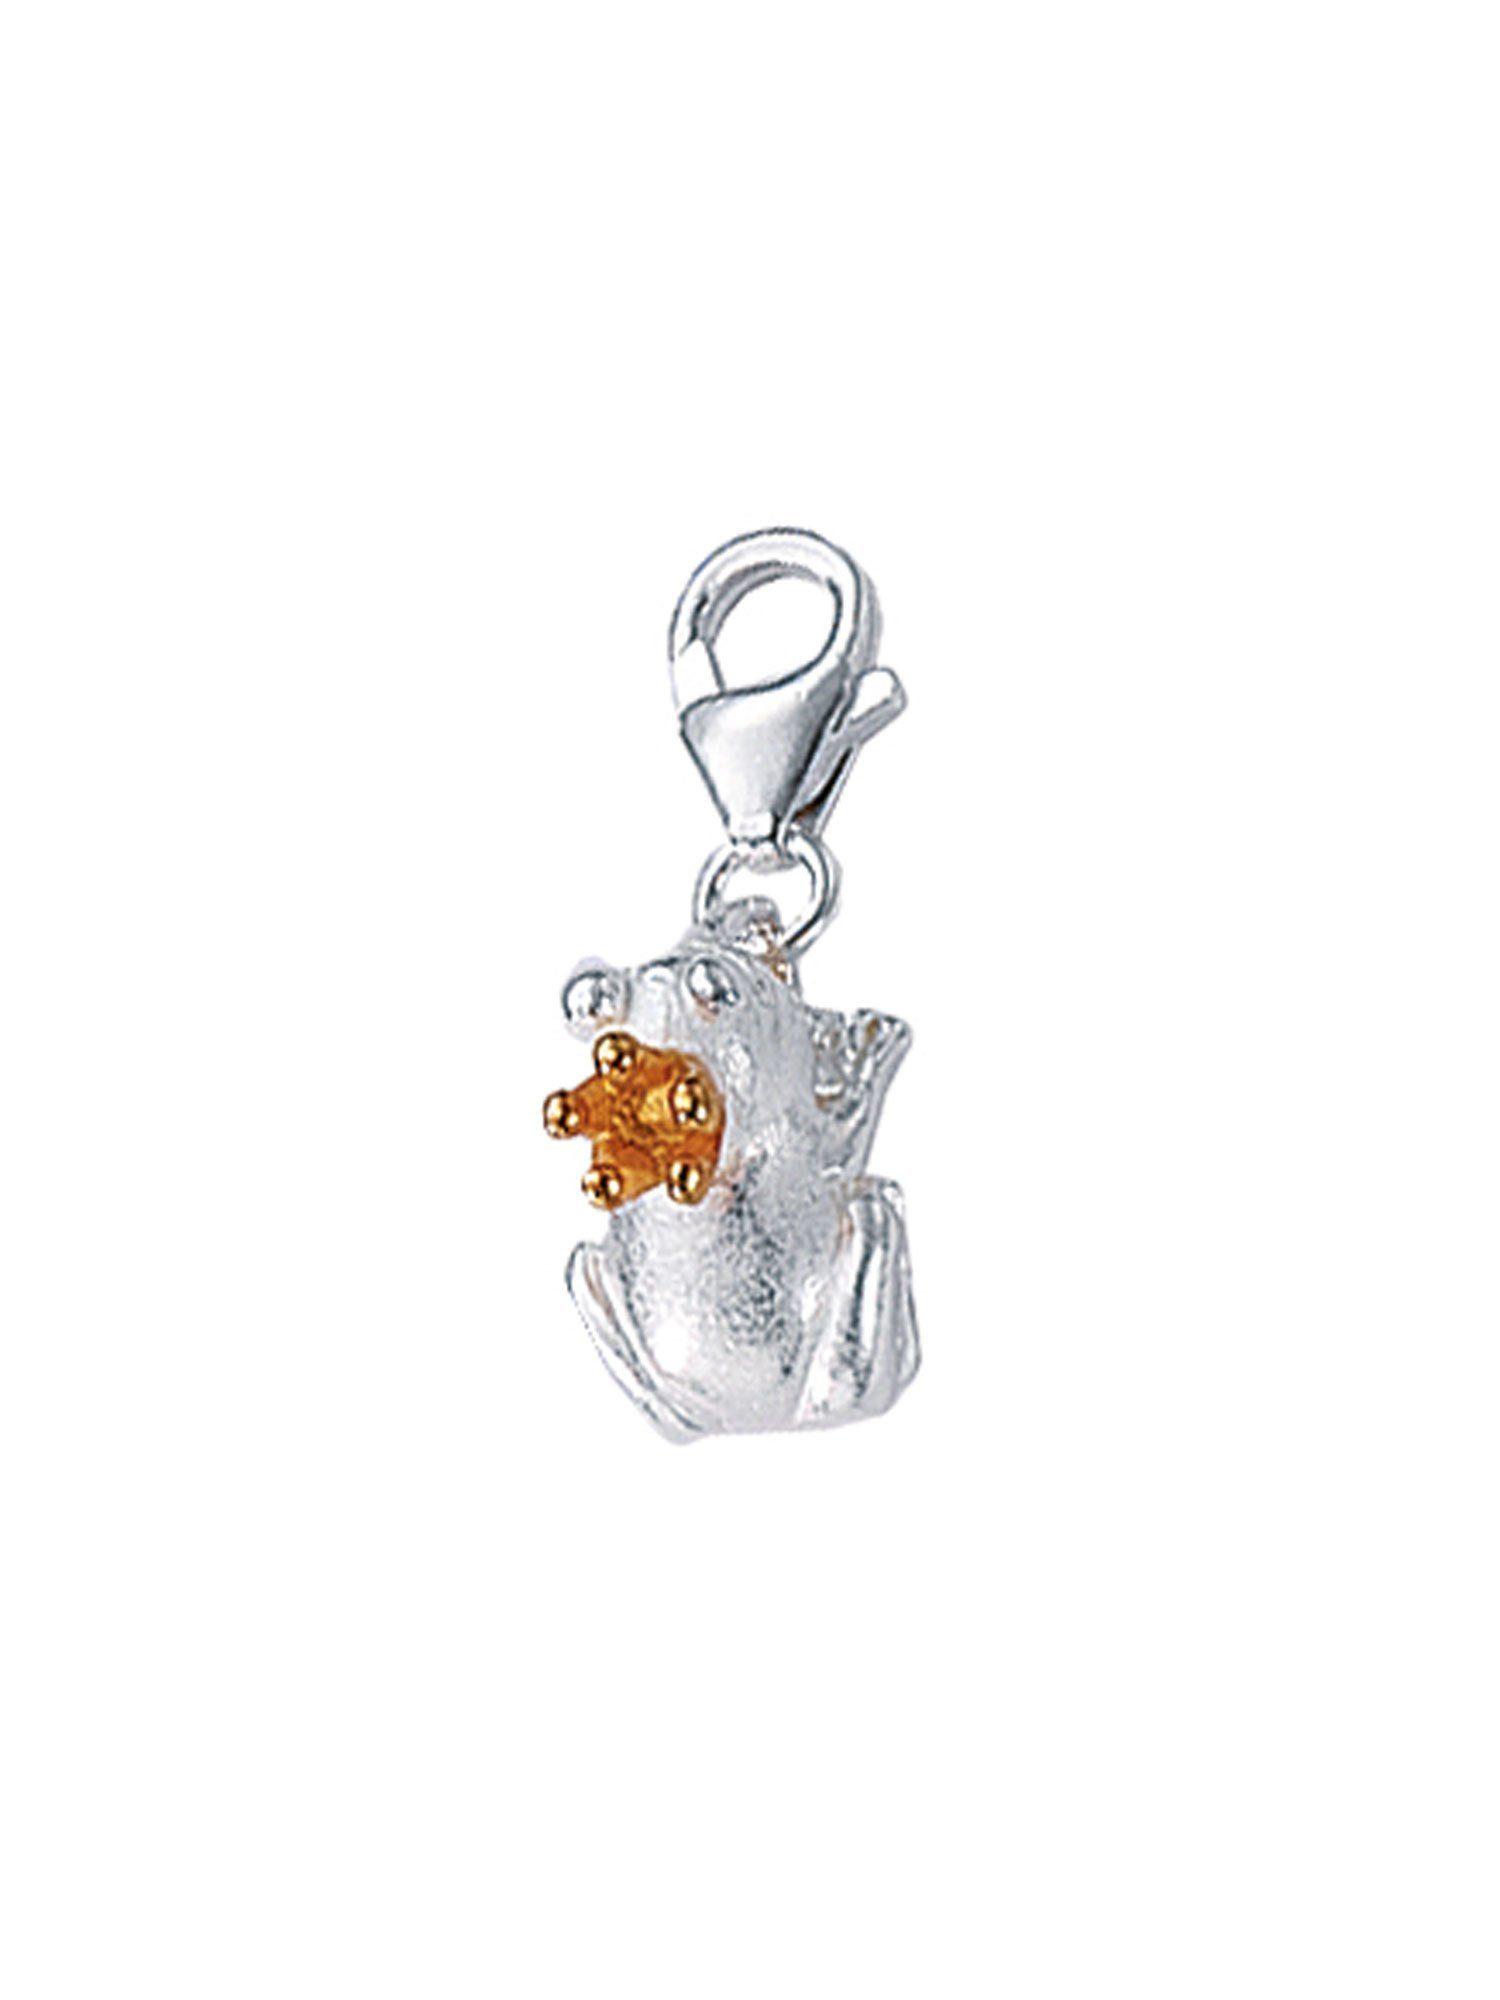 Adelia´s Charm-Einhänger »Silber Anhänger« Frosch 925 Sterling Silber vergoldet